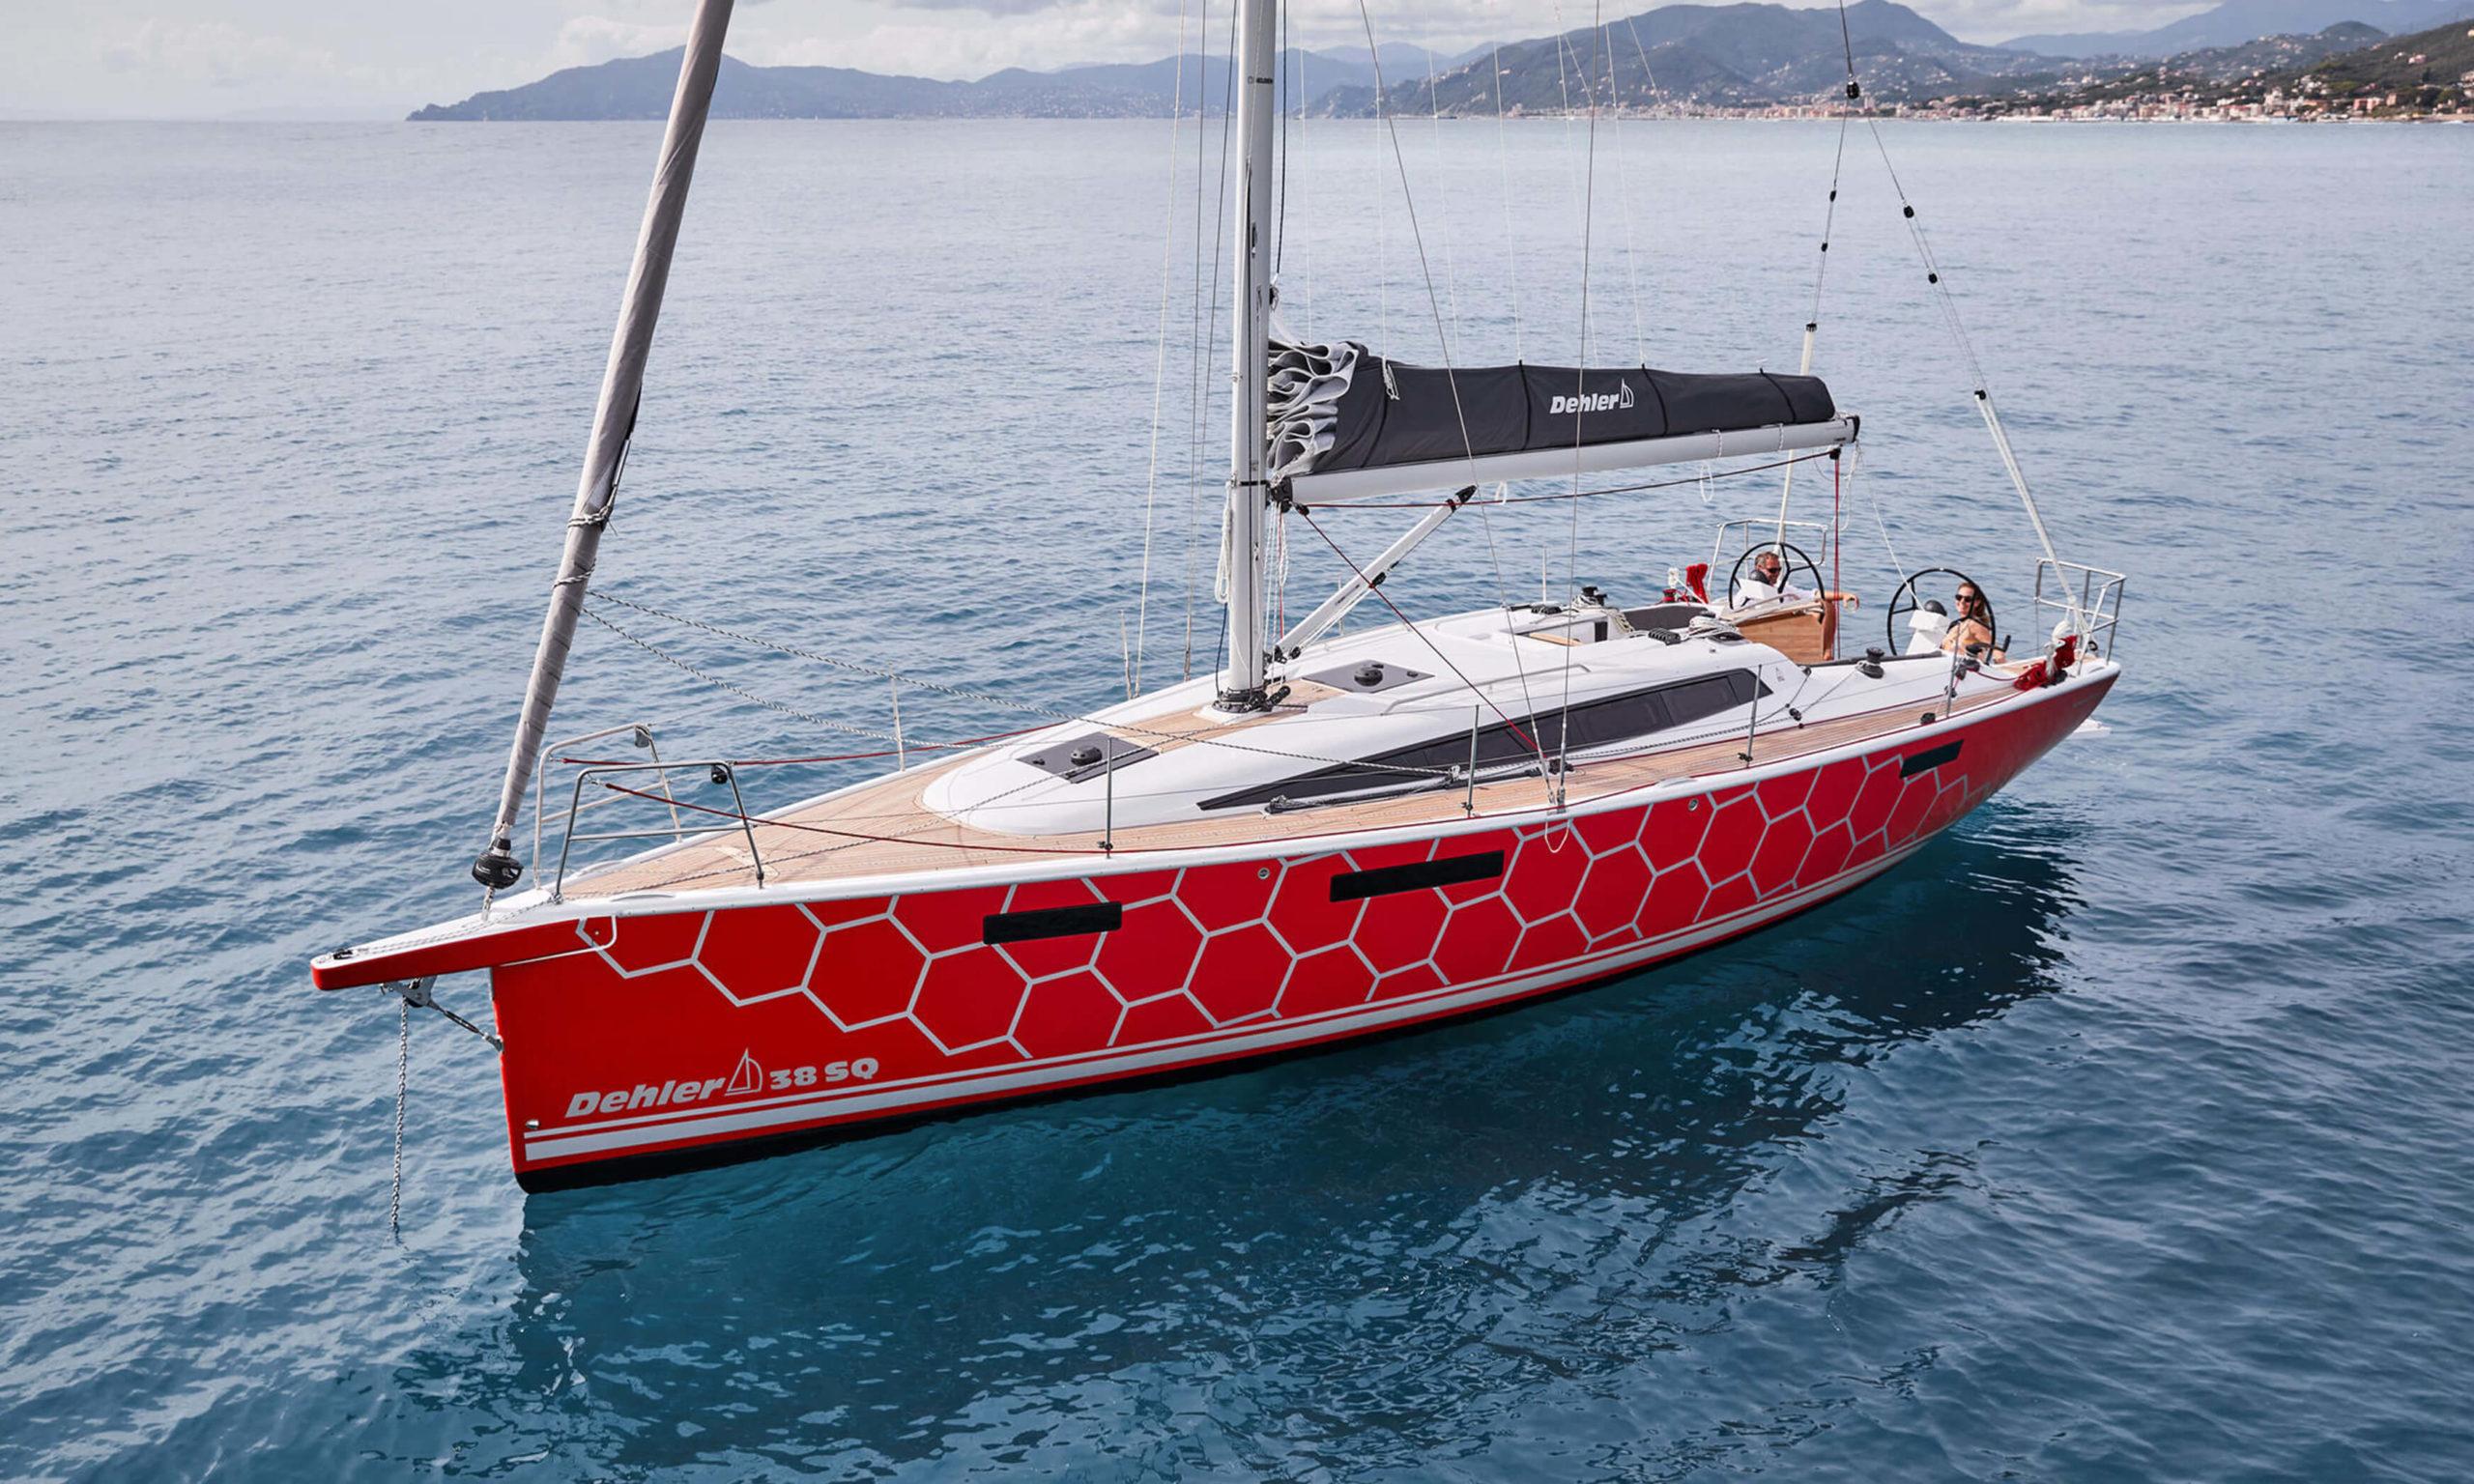 Delher_38_SQ_Navicap_agde_voilier_bateau_accastillage_neuf_cantier_naval